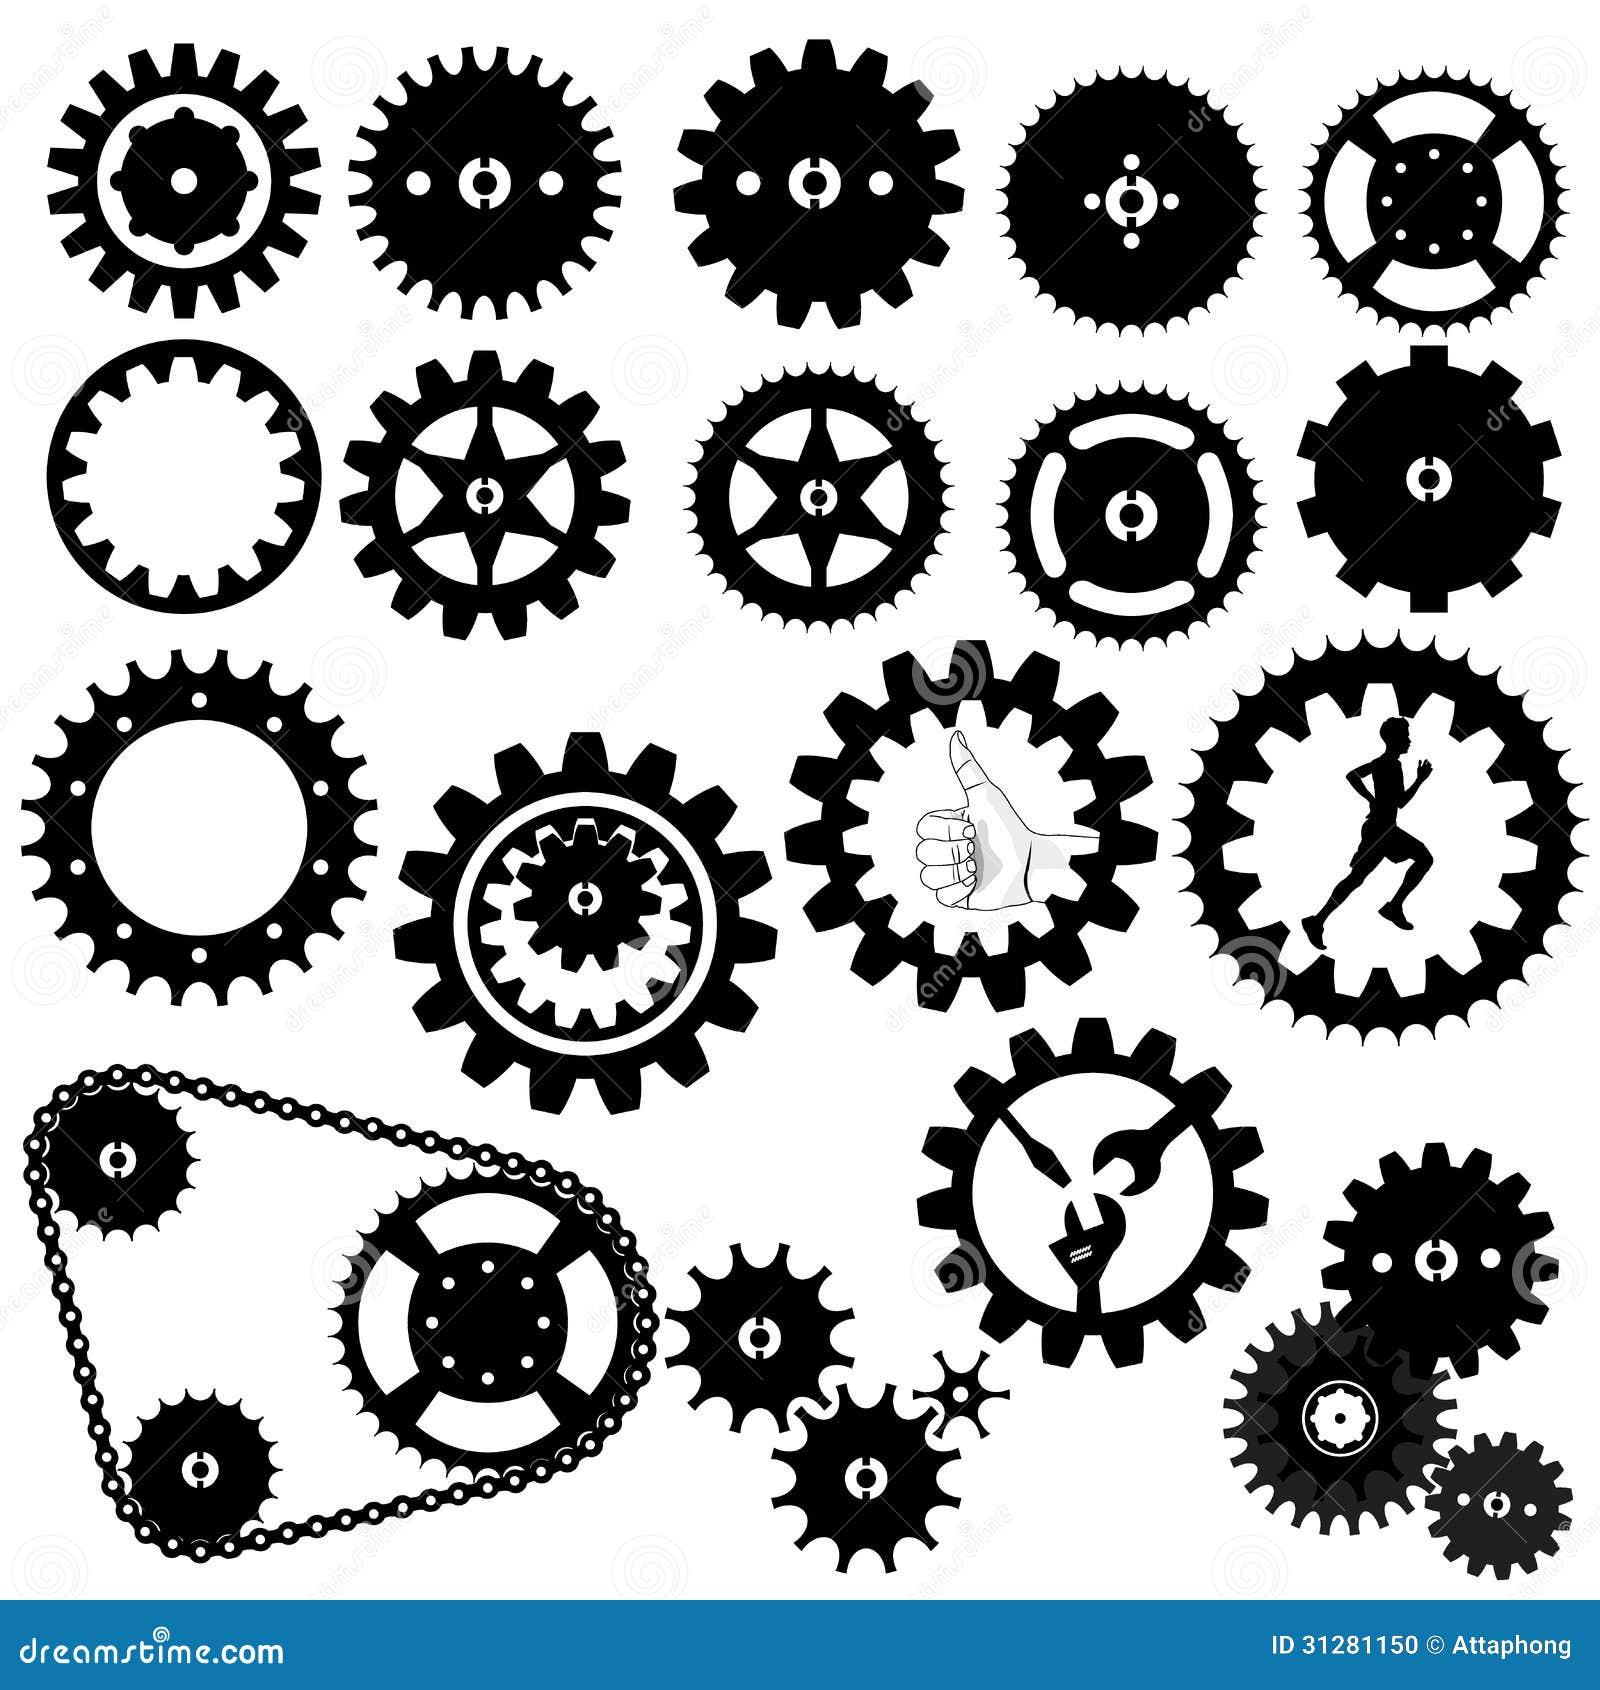 gears cogs free illustrator - photo #38